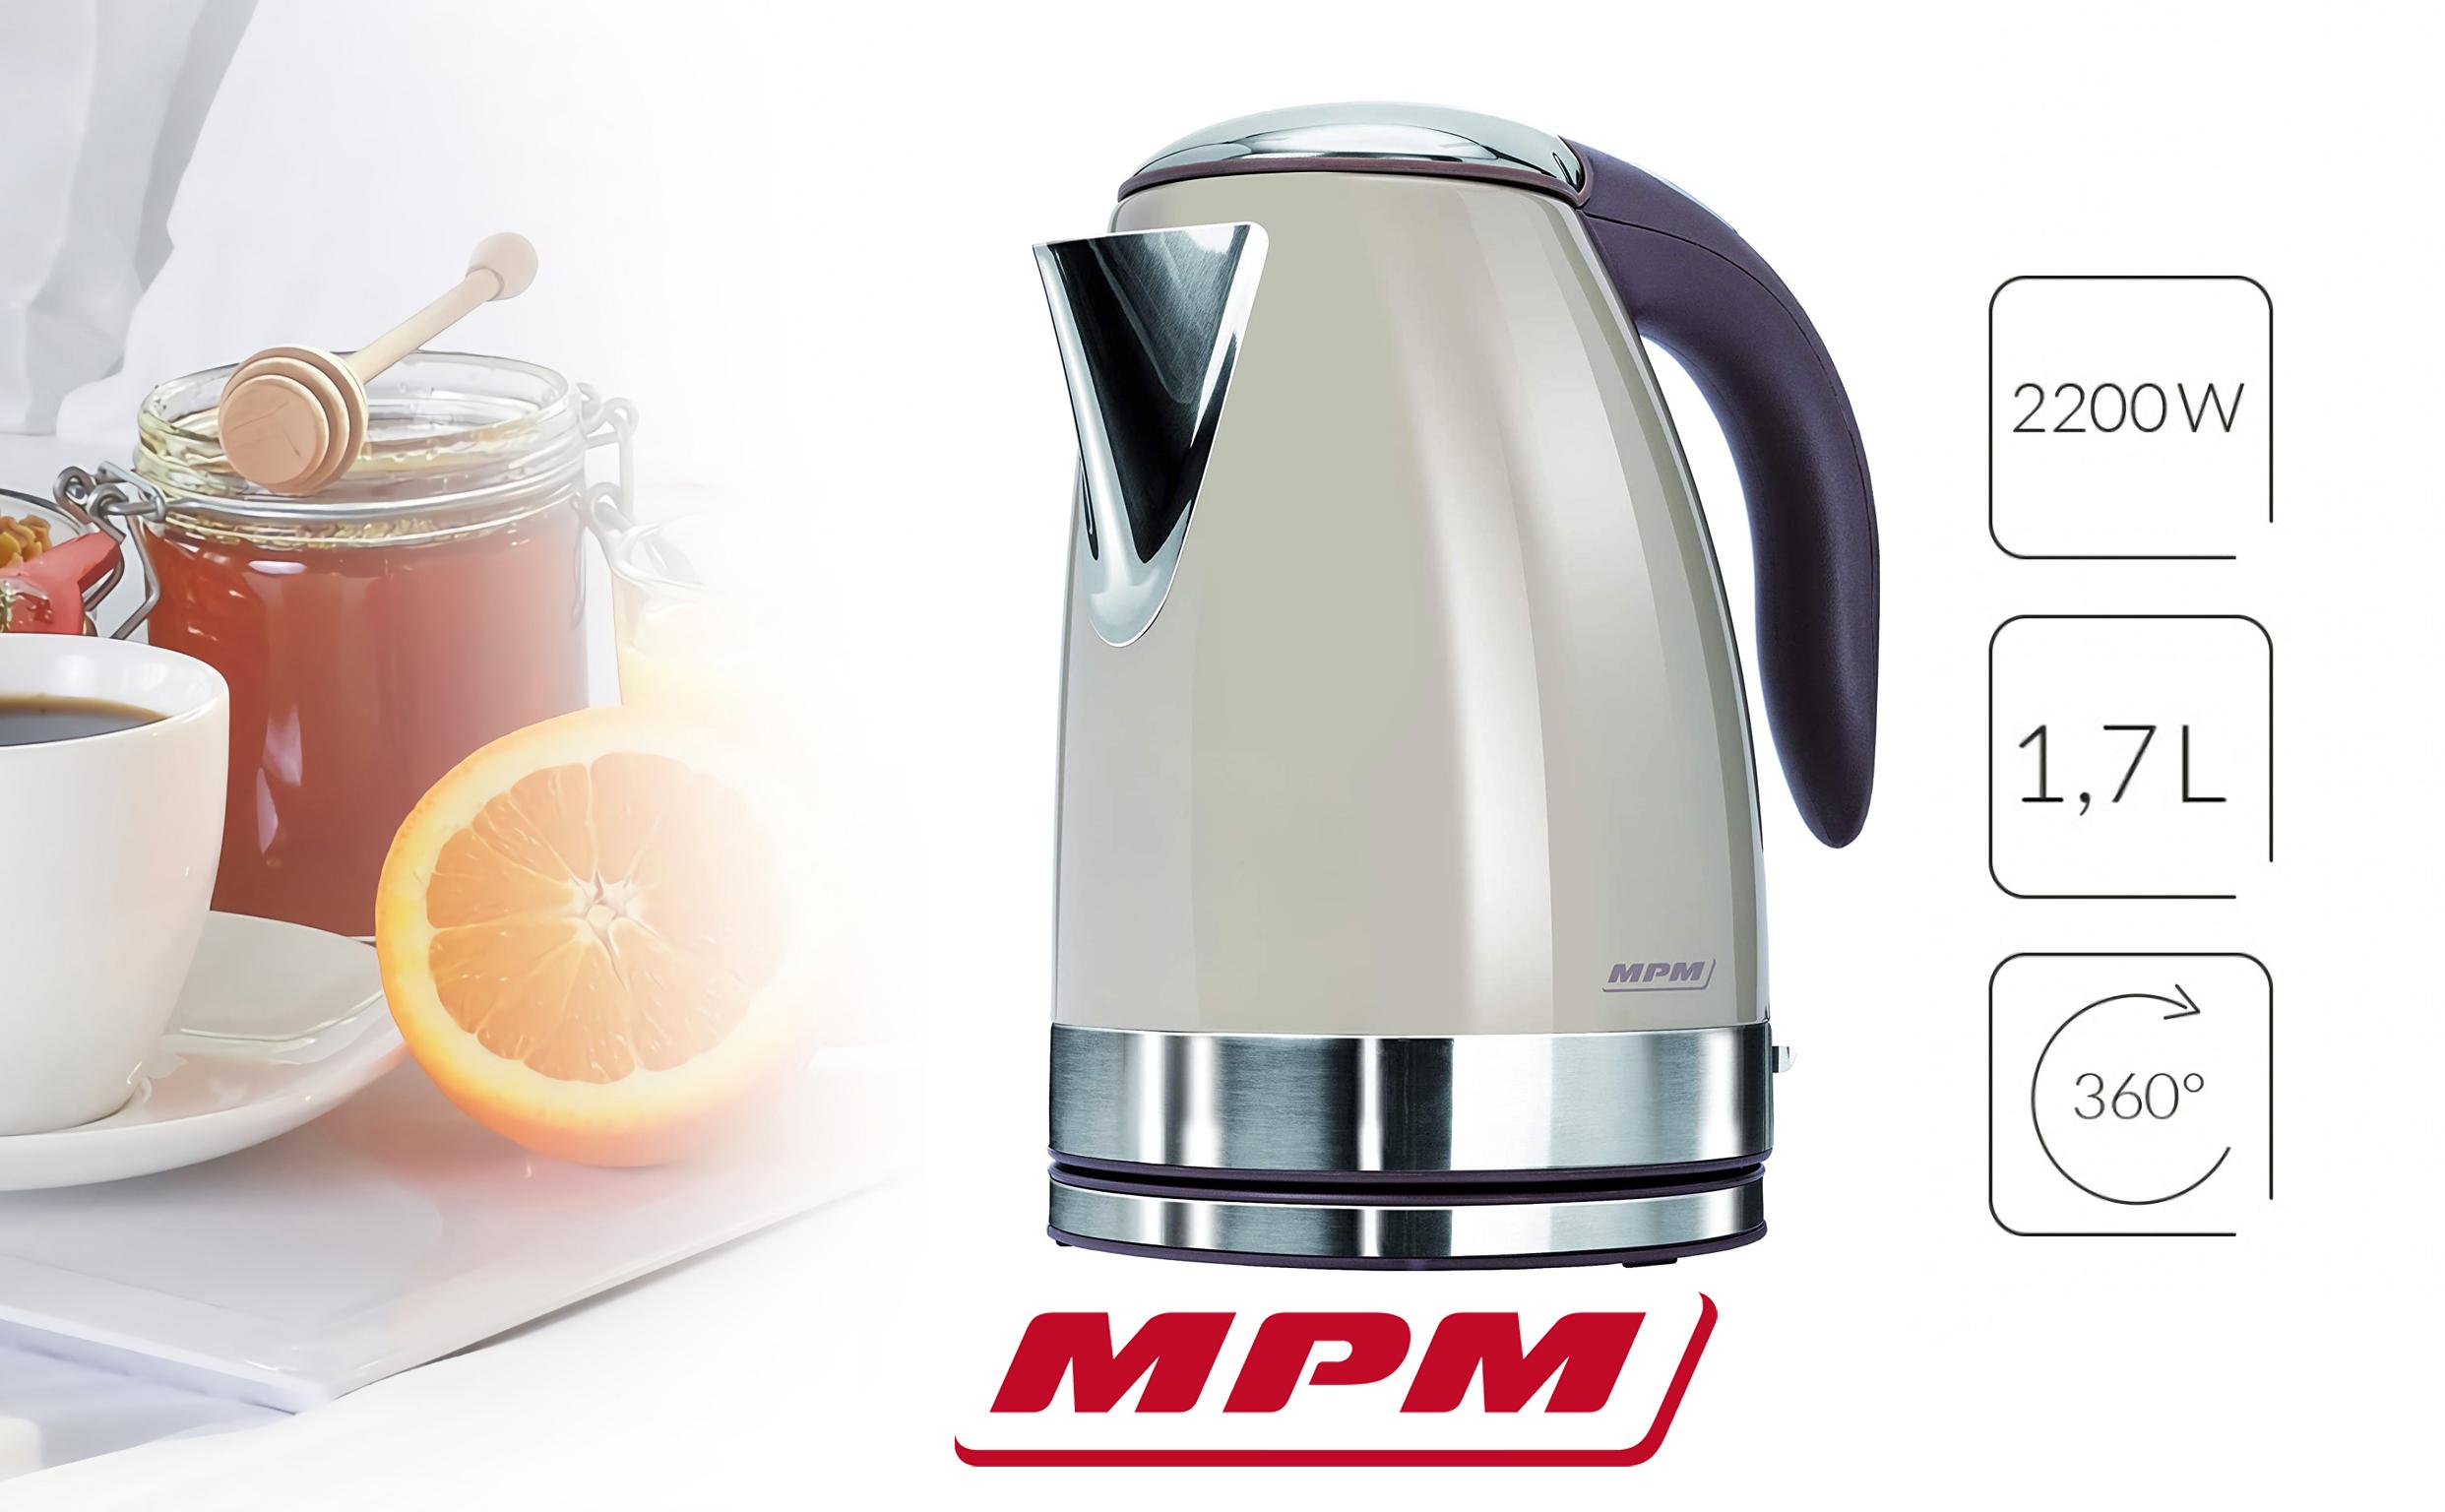 MPM MCZ-59B Hervidor De Agua Eléctrico de Acero Inoxidable. 1,7 Litros, Tapa automática, Filtro Anti cal, Base 360º, 2200w